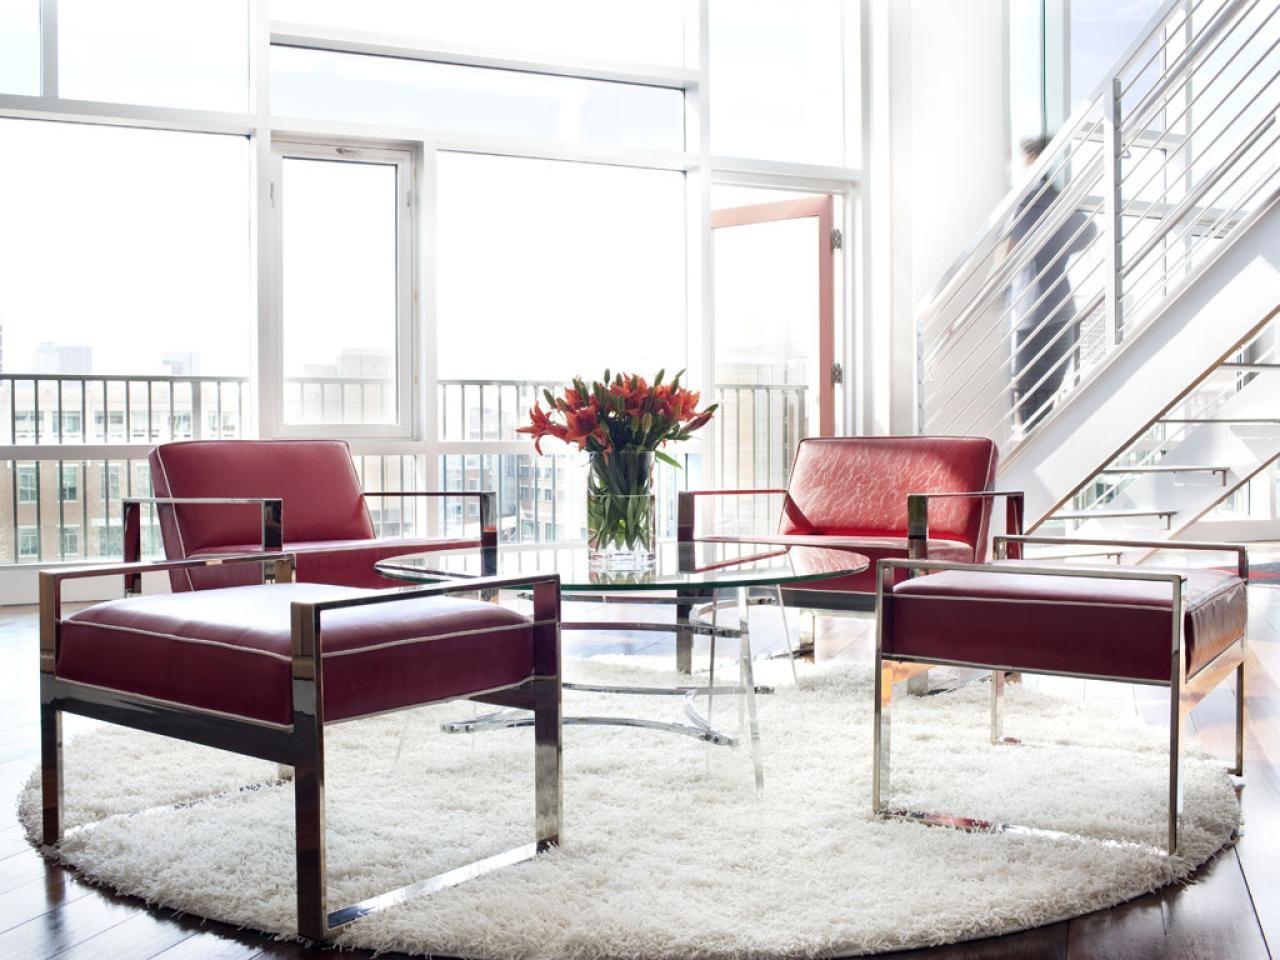 Urban Spaces: Minimalist Modern Atlanta Loft | Loft interior design ...